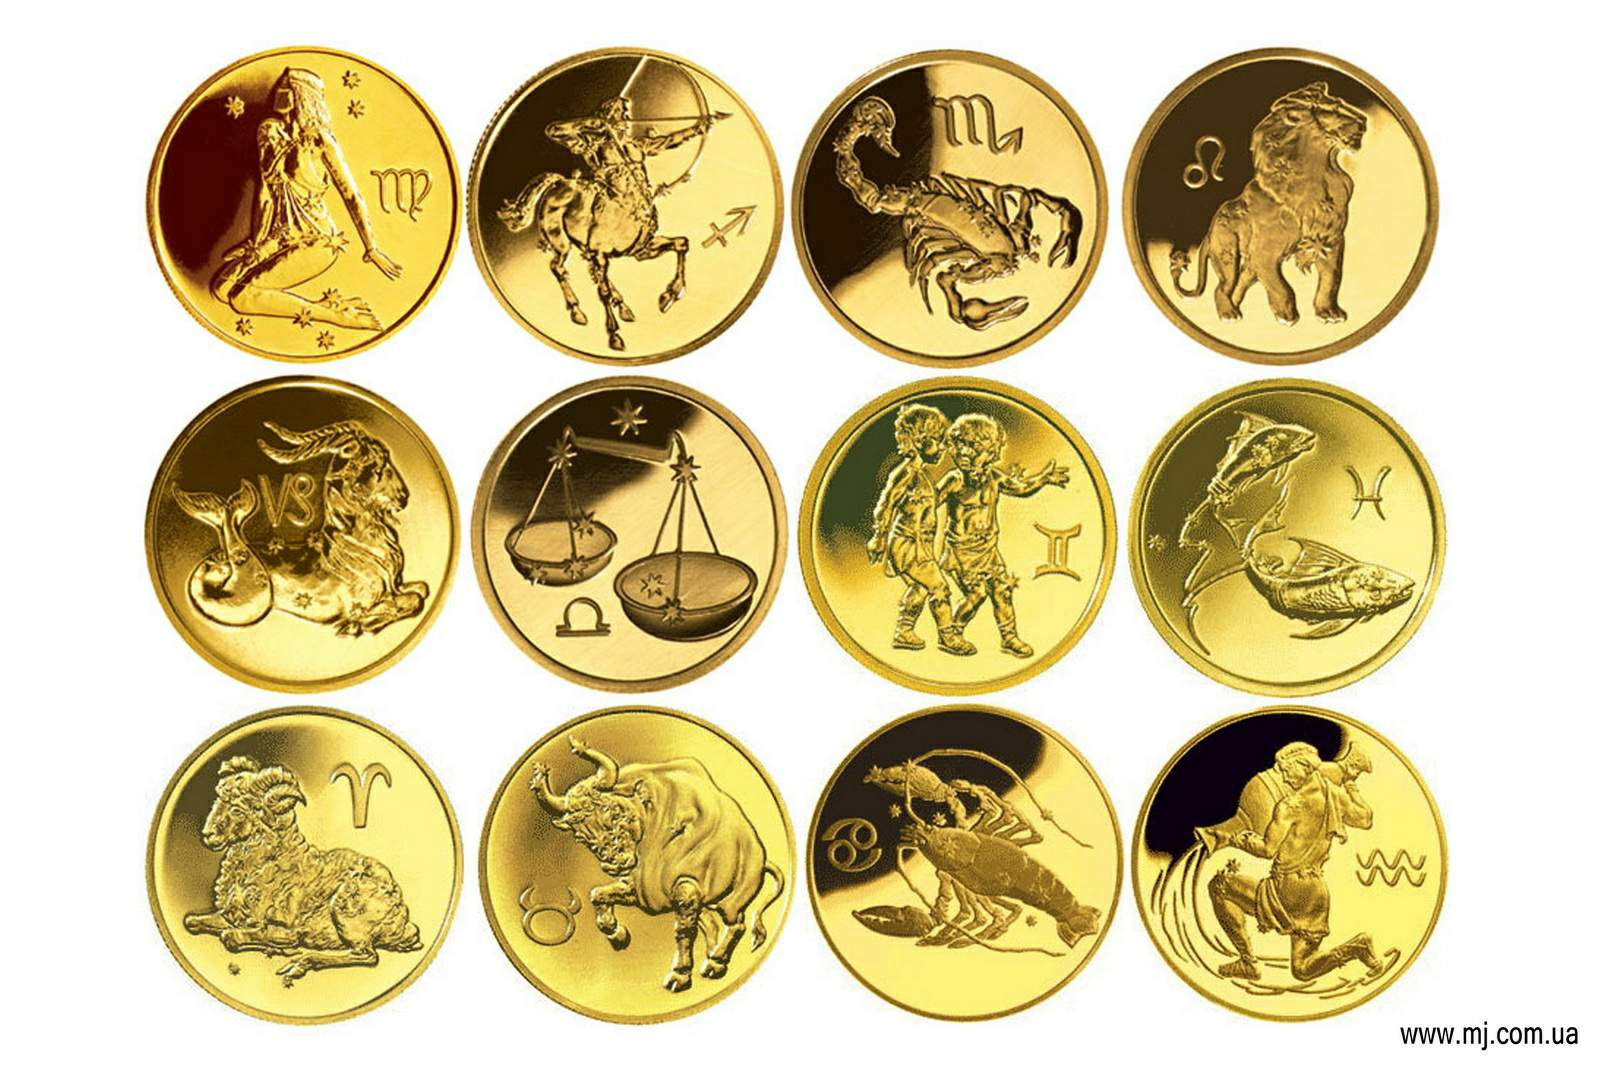 Zodiac Symbols Signs of the zodiac by mj